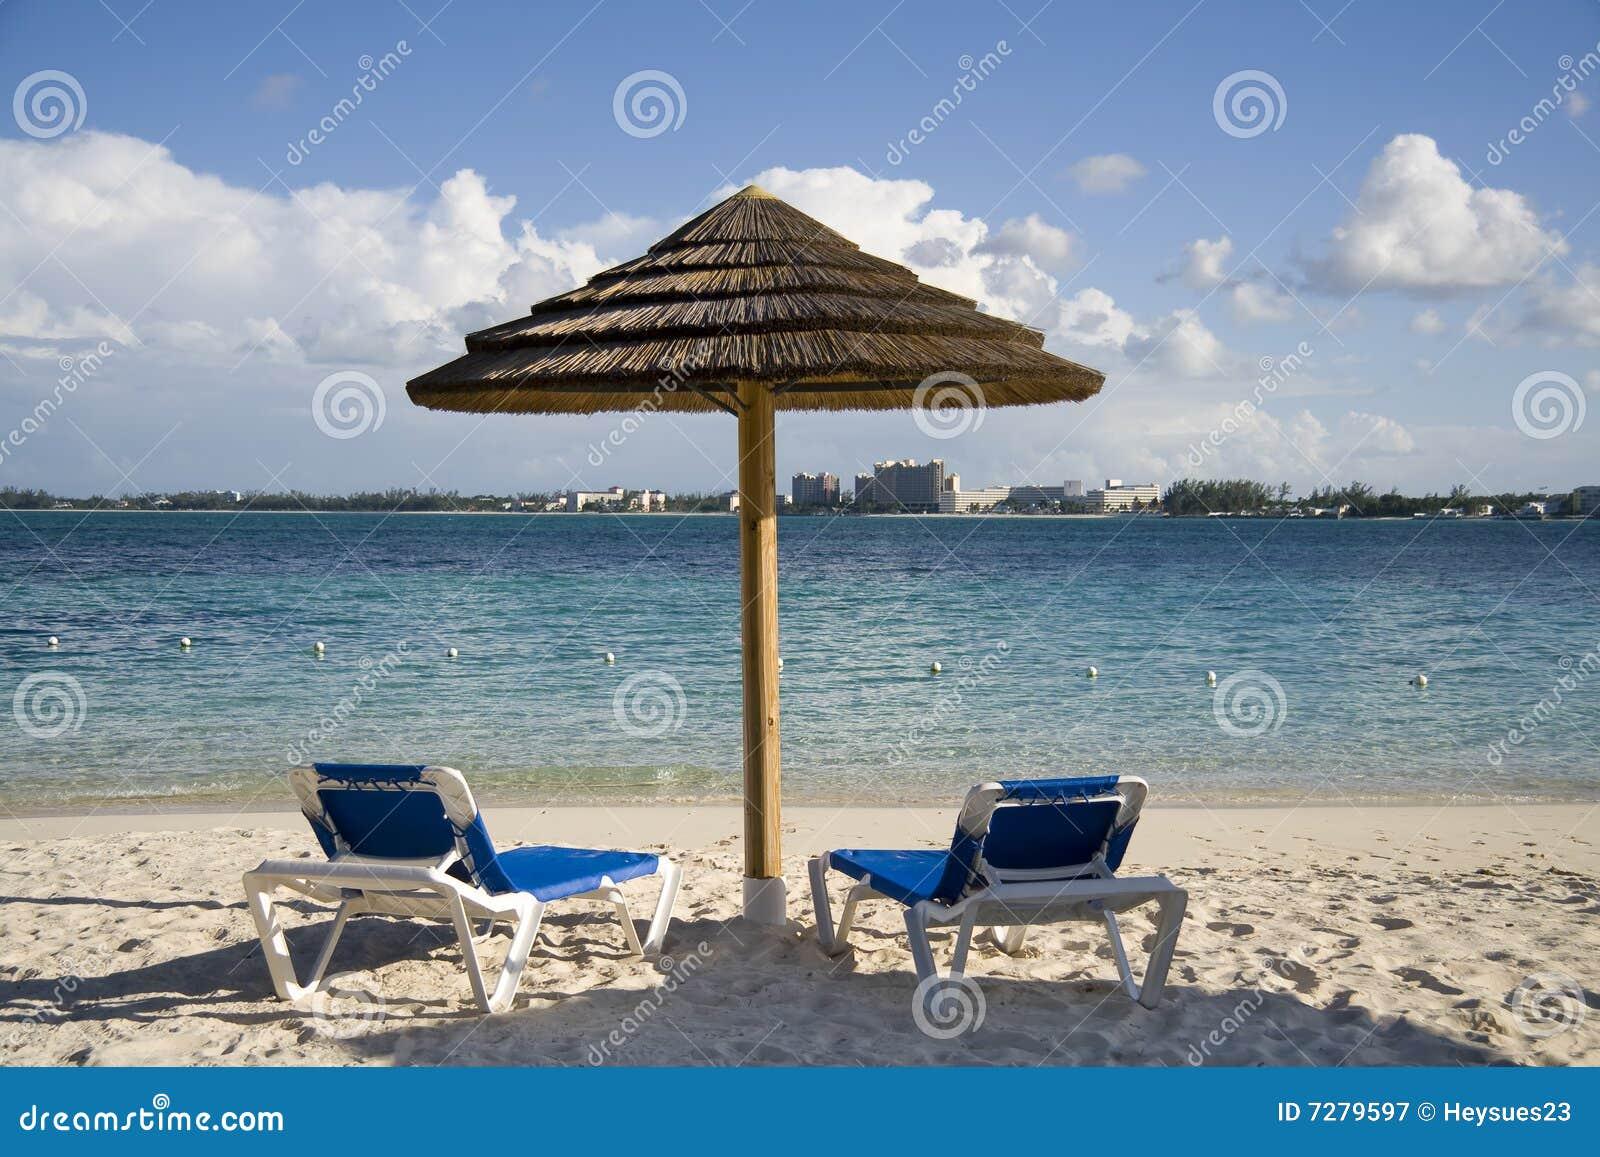 Tropical Island Beach Hut: Beach Hut And Chairs On Tropical Island Royalty Free Stock